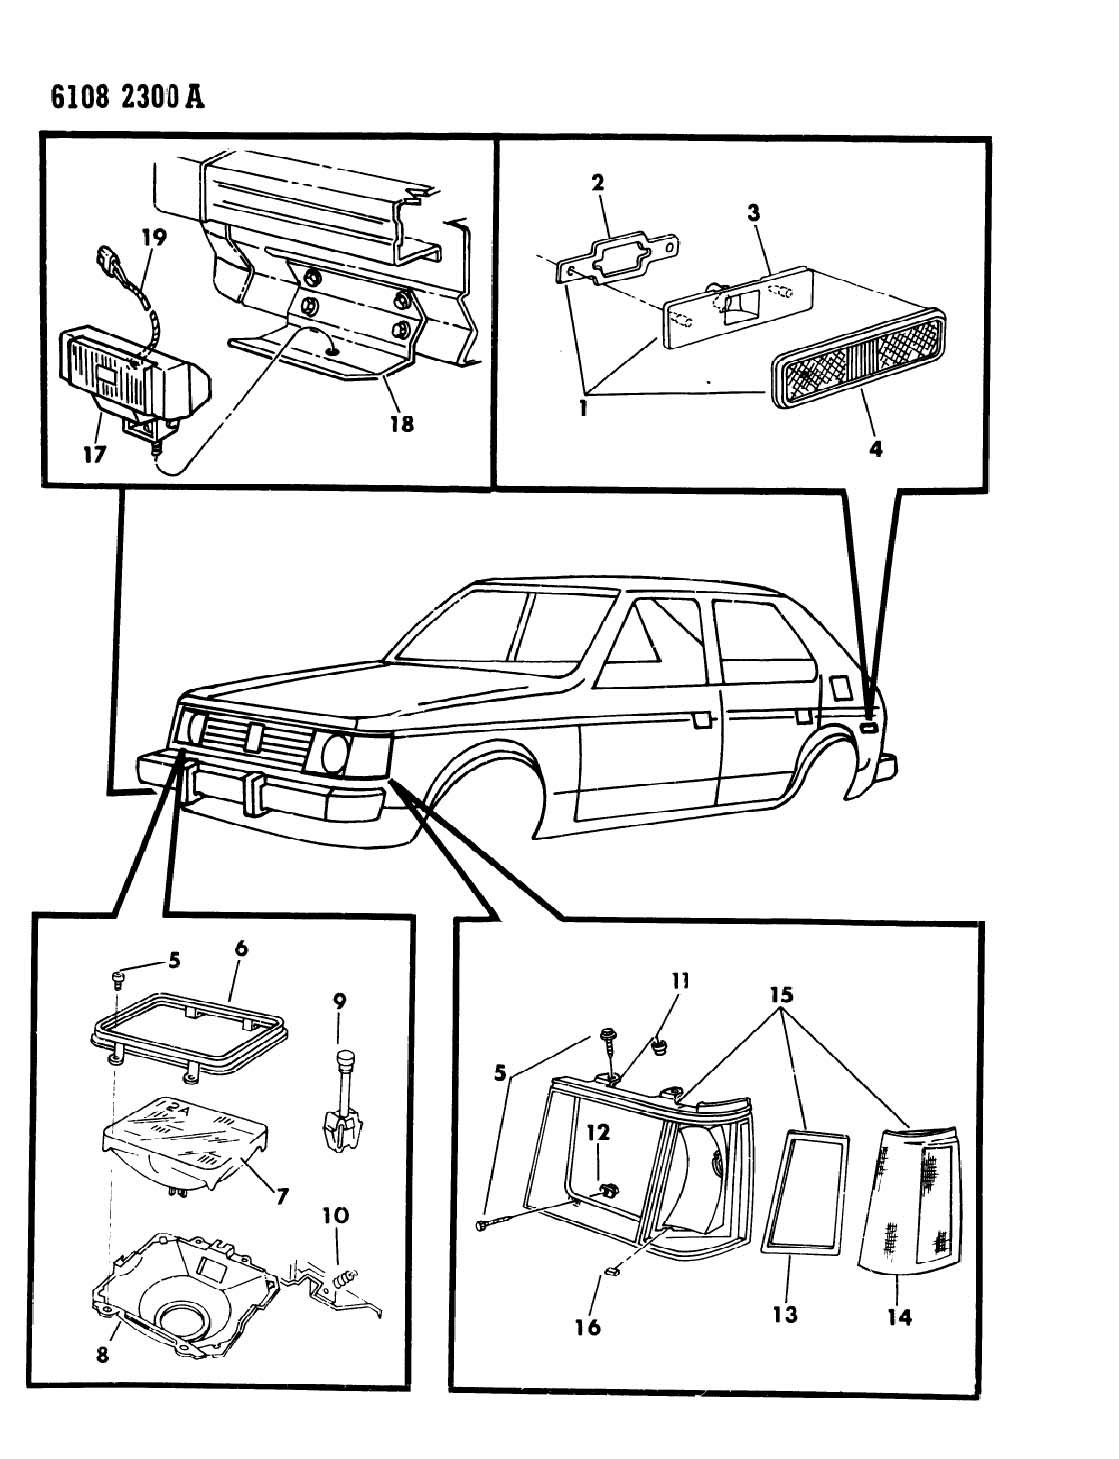 1993 Dodge Nut and screw, nut and screw, h/lamp seat adj